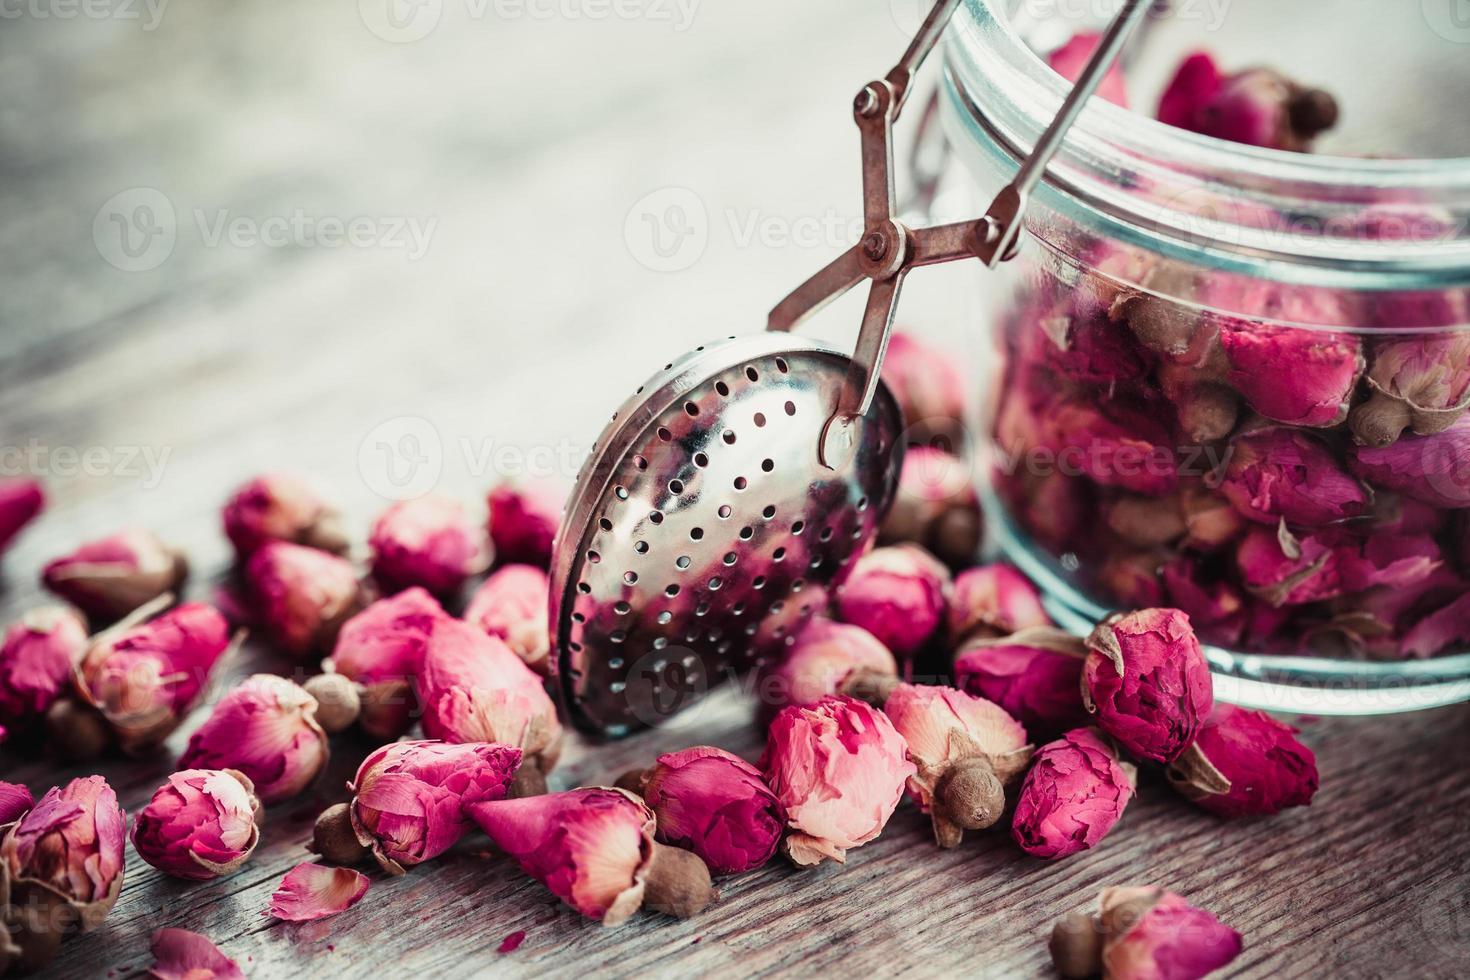 Rose buds tea, tea infuser and glass jar. photo